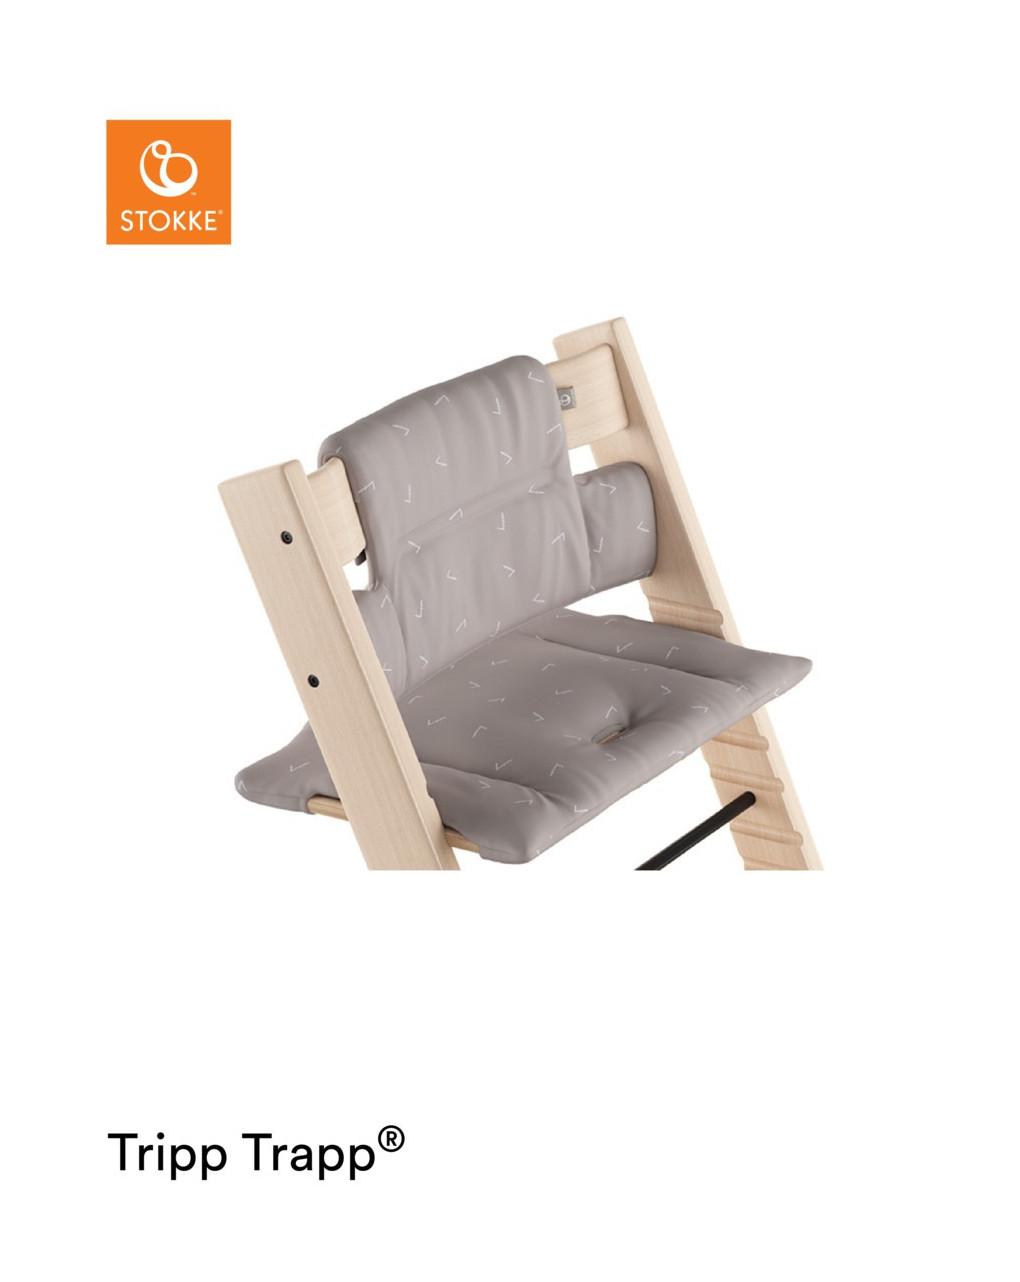 Almofada tripp trapp® - ícone cinza - Stokke